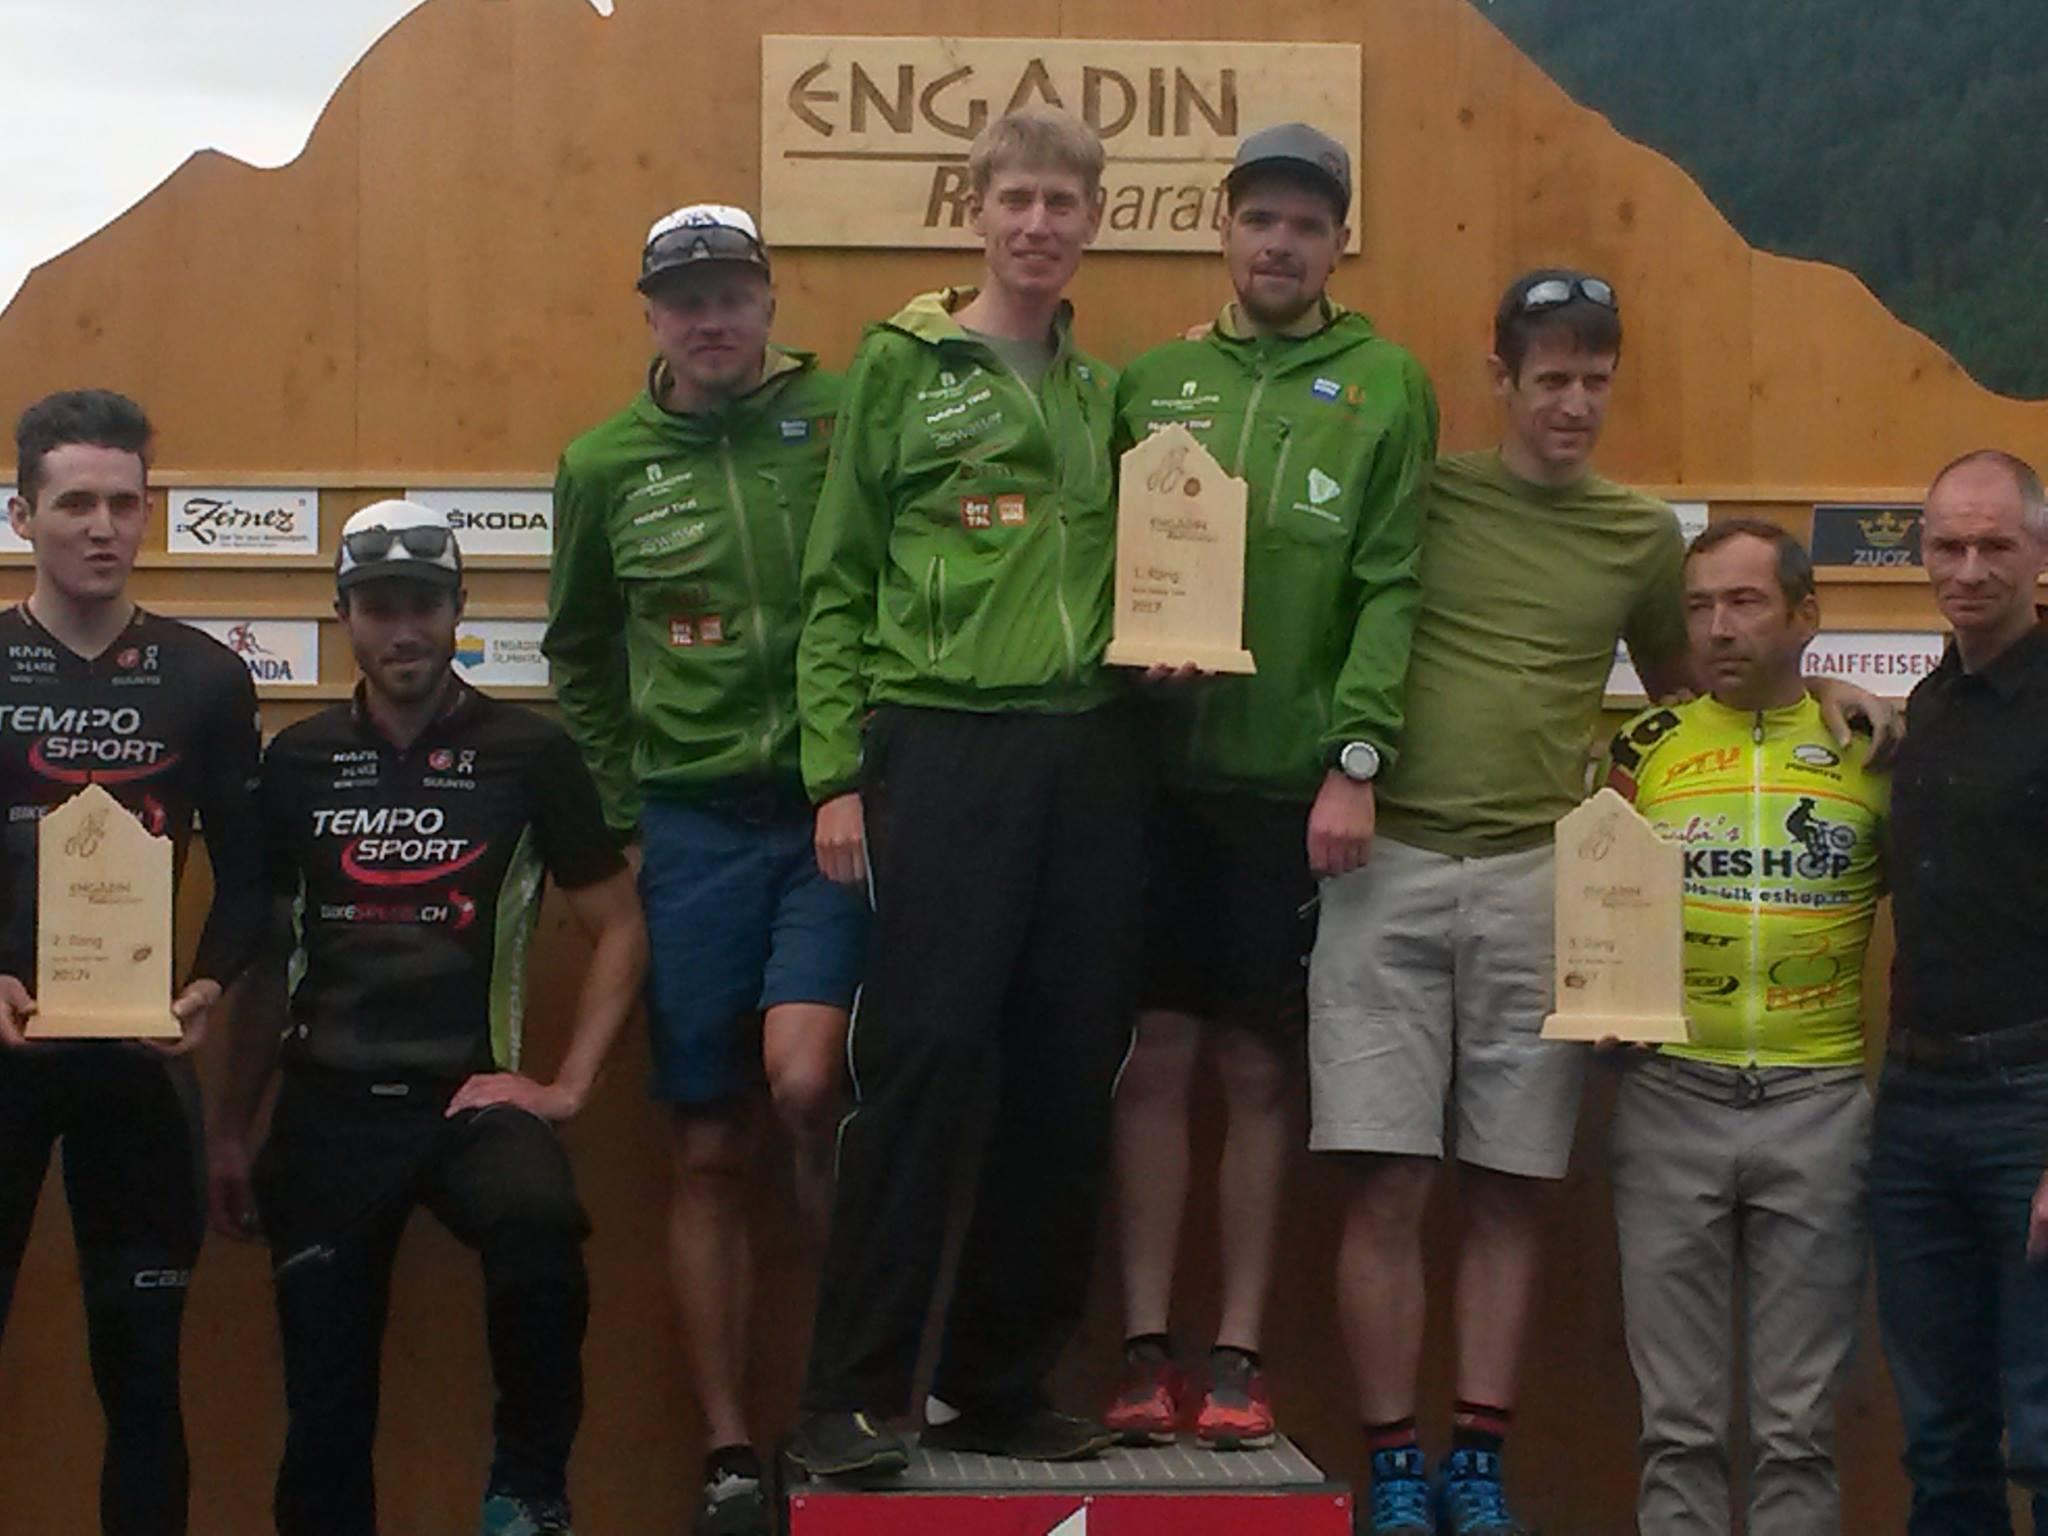 1. Platz Teamwertung kurze Strecke